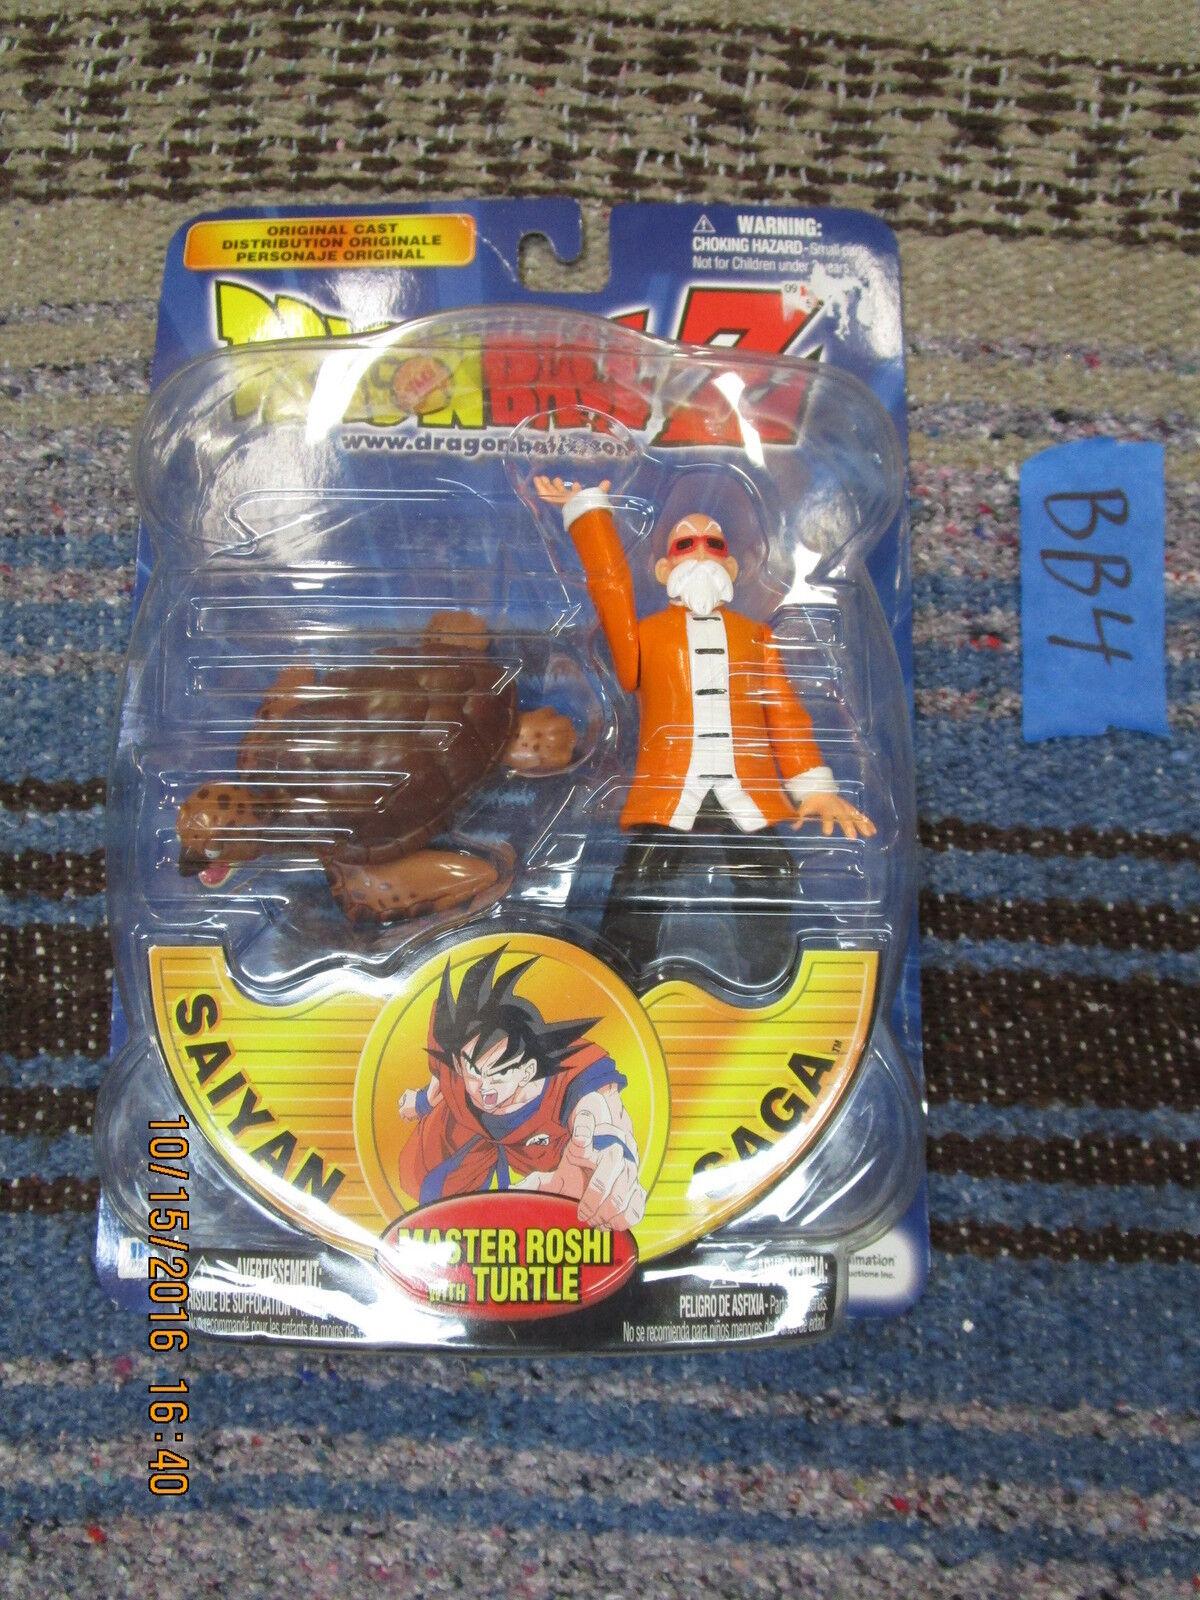 Irwin Jouets Dragon Ball Z Master Roshi Orange Variante Saiyan  Saga dbz dragonball  point de vente